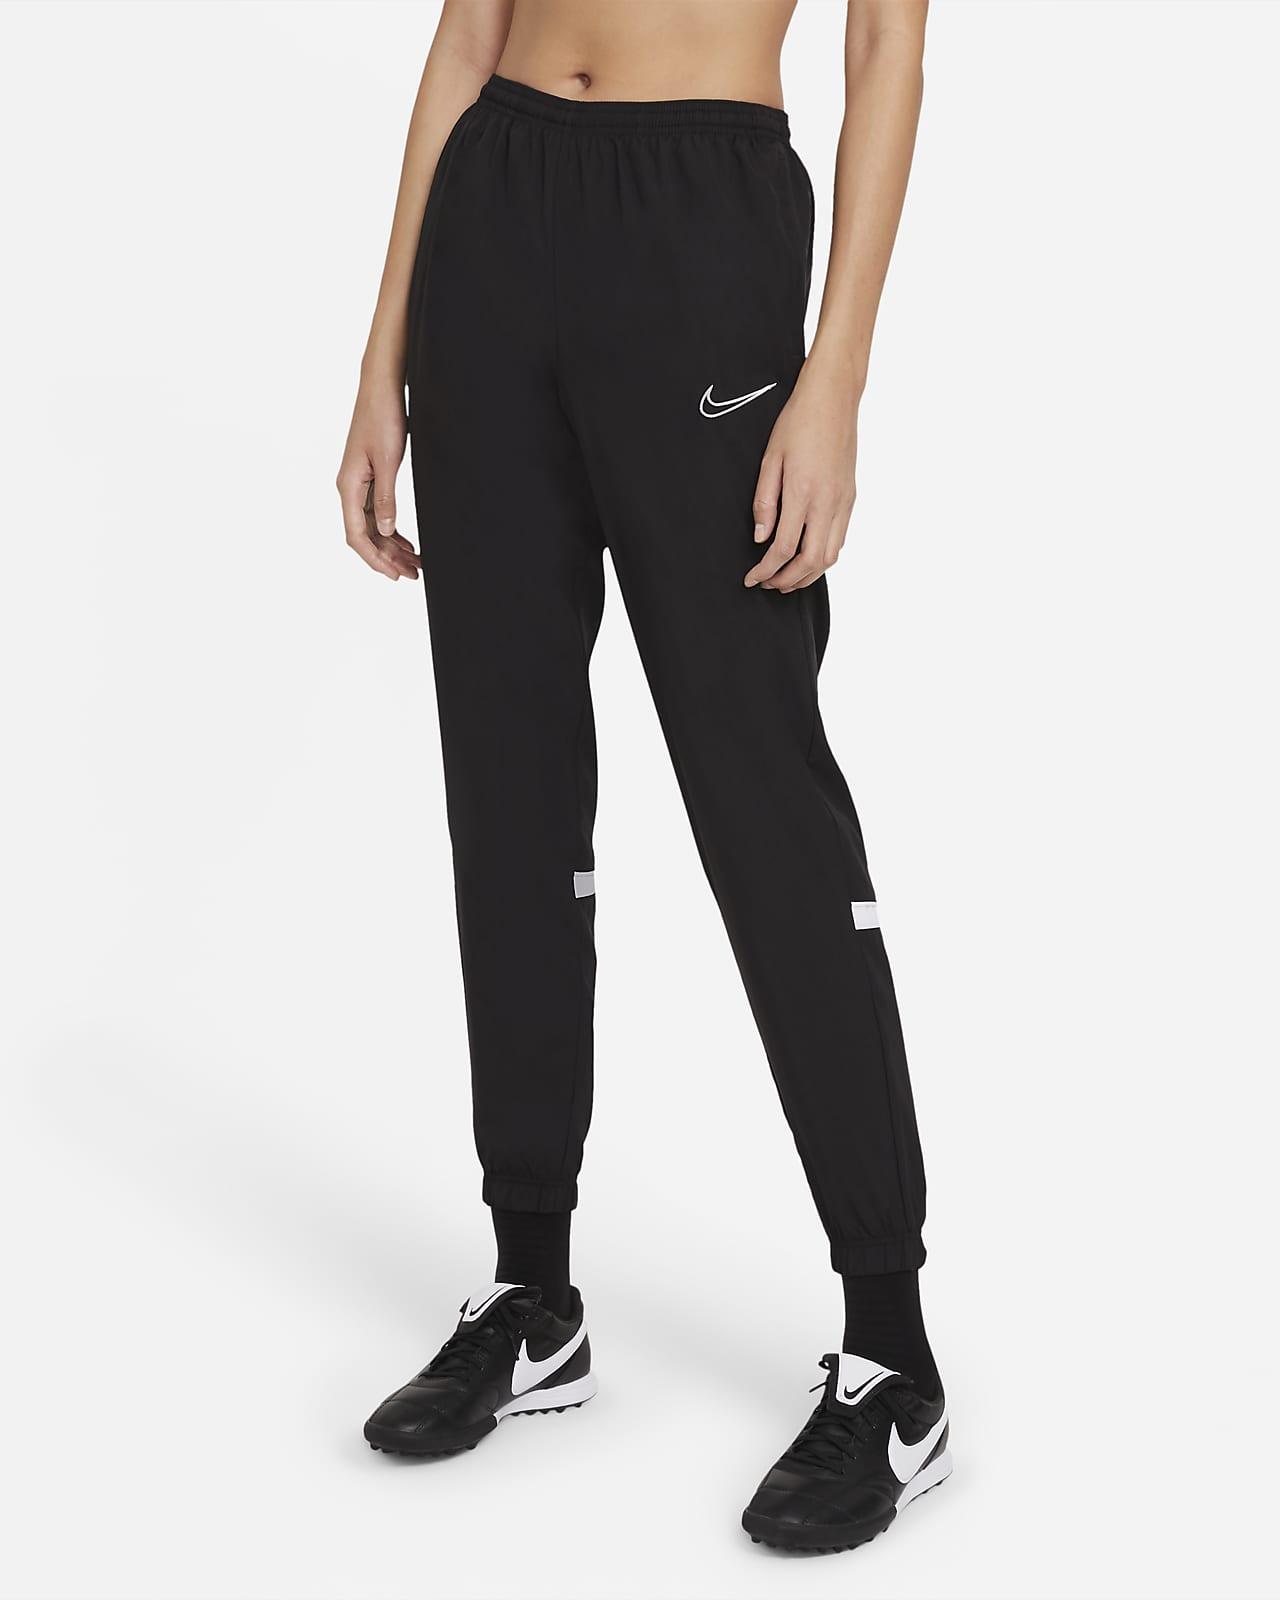 Nike Dri-FIT Academy Women's Woven Soccer Track Pants